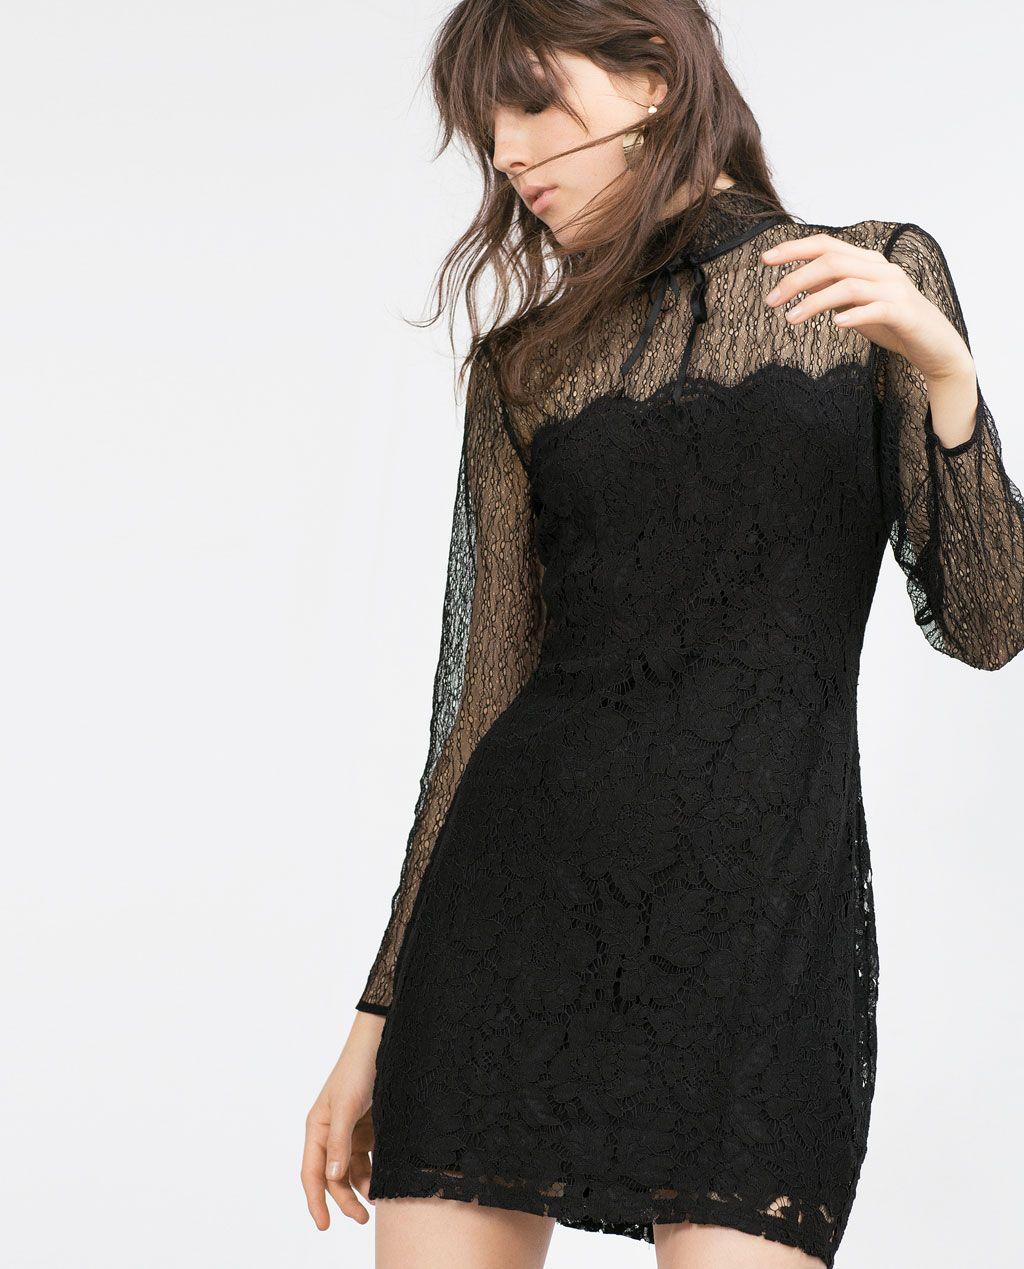 1b40f838 Image 2 of LACE DRESS from Zara | C - *A-Line & Skater | Zara ...